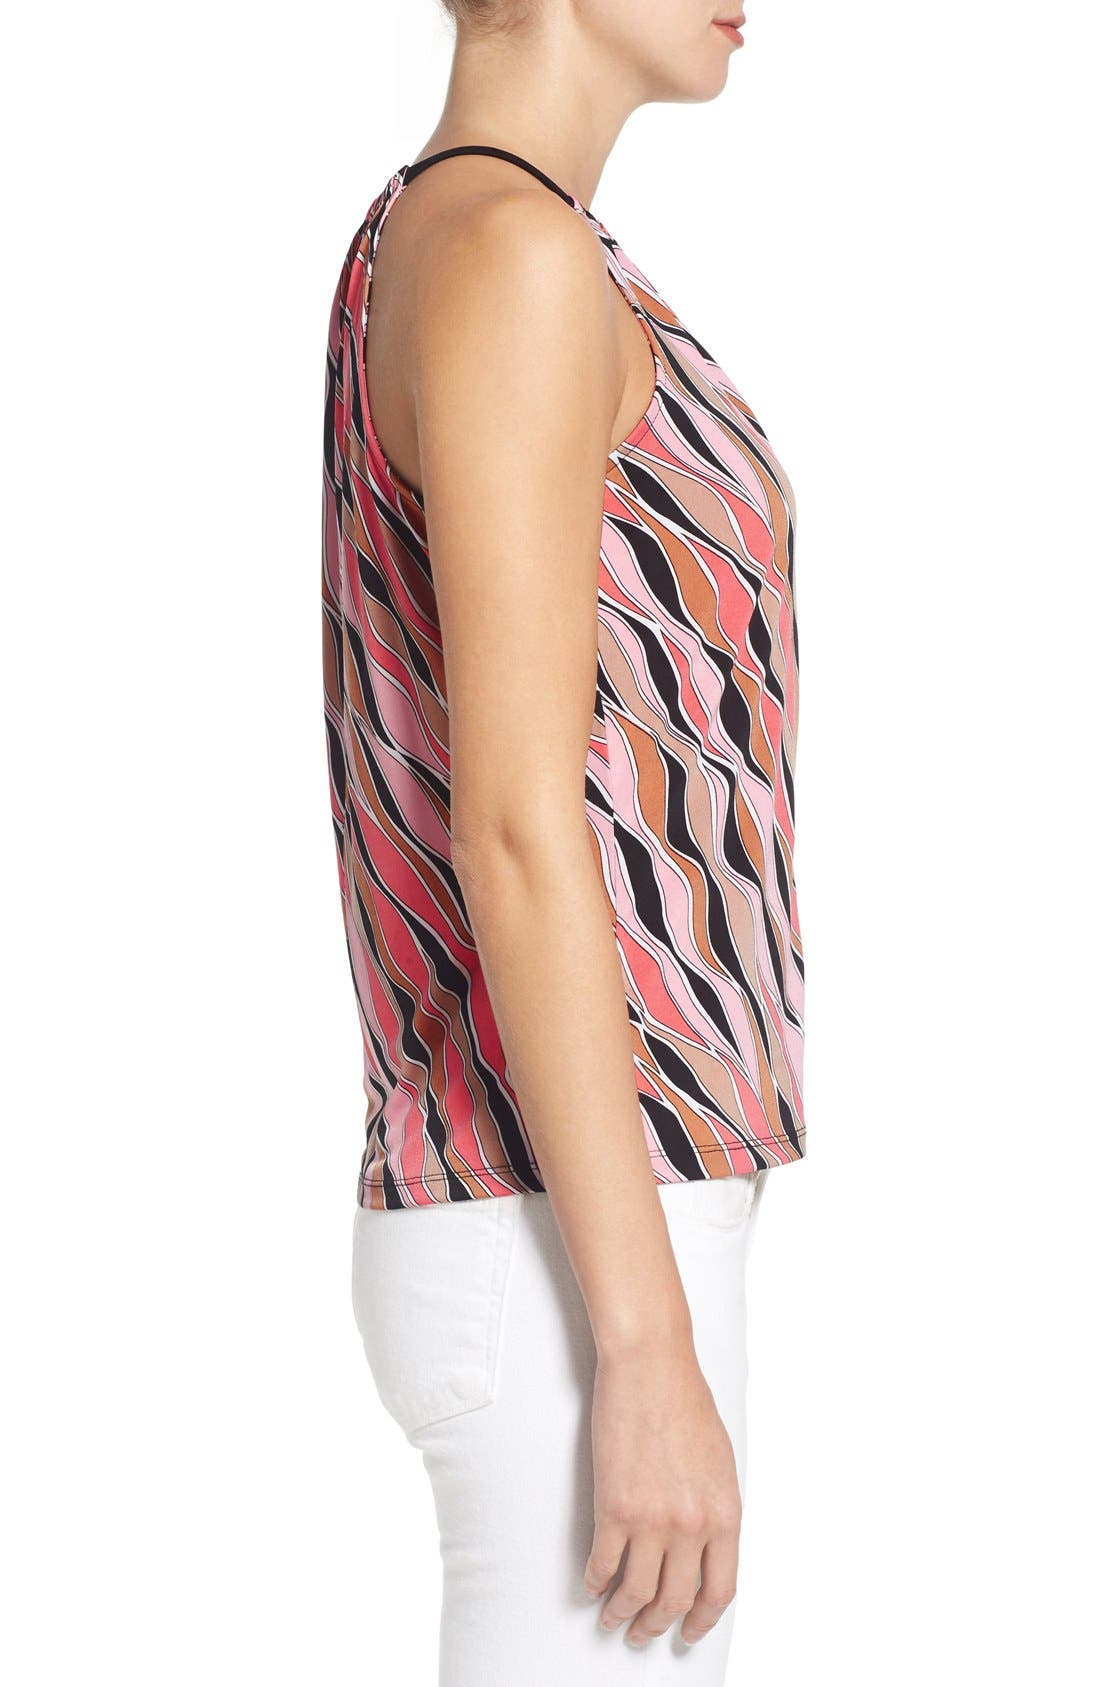 Alternate Image 3  - MICHAEL Michael Kors 'Coley' Print Jersey Halter Style Top